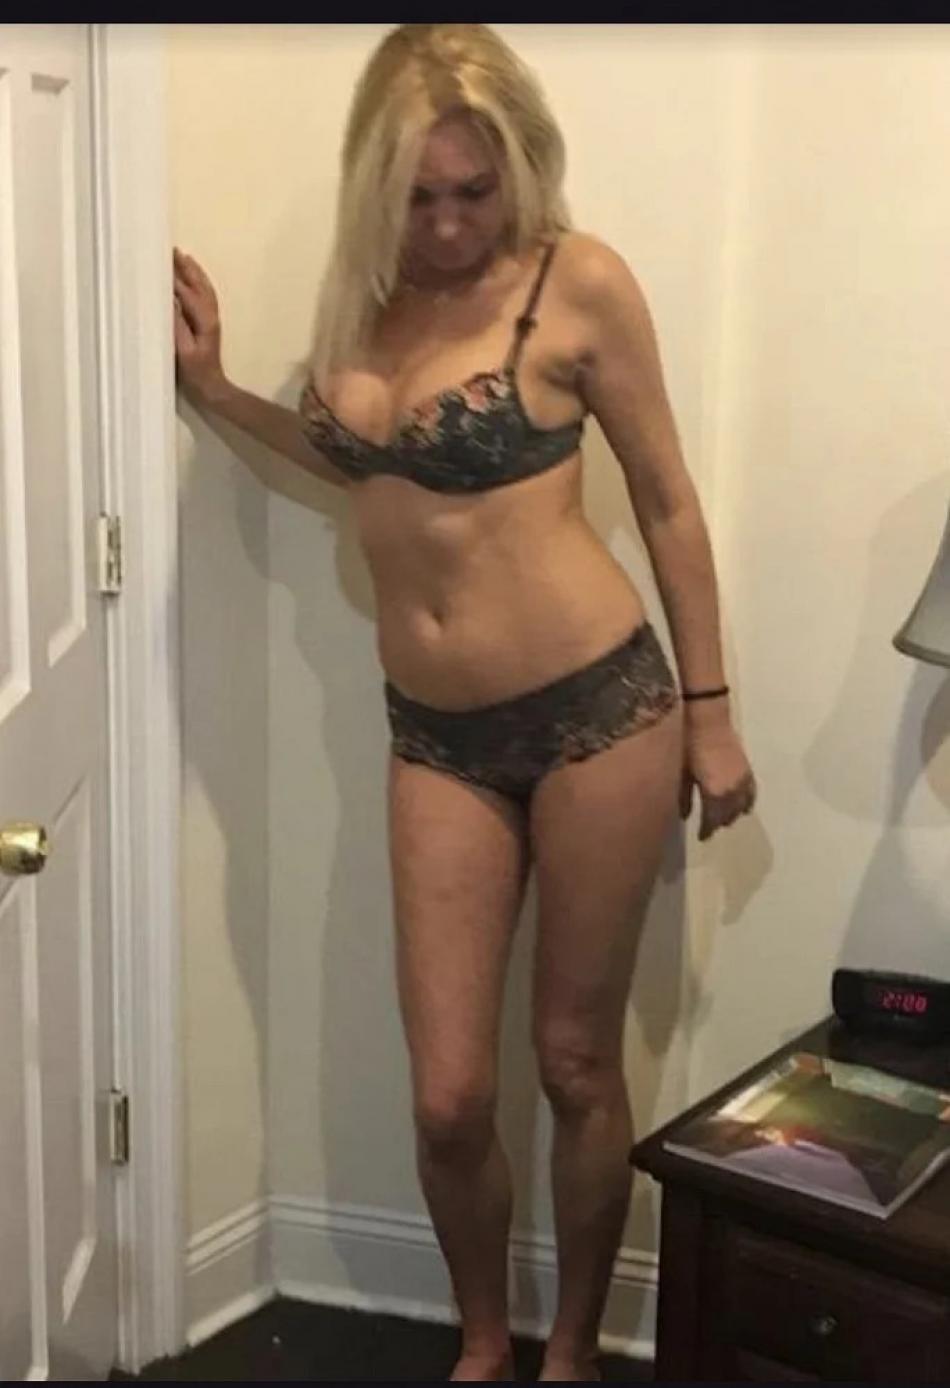 STANDART NYC MISTRESS Body Rubs by Editha 6